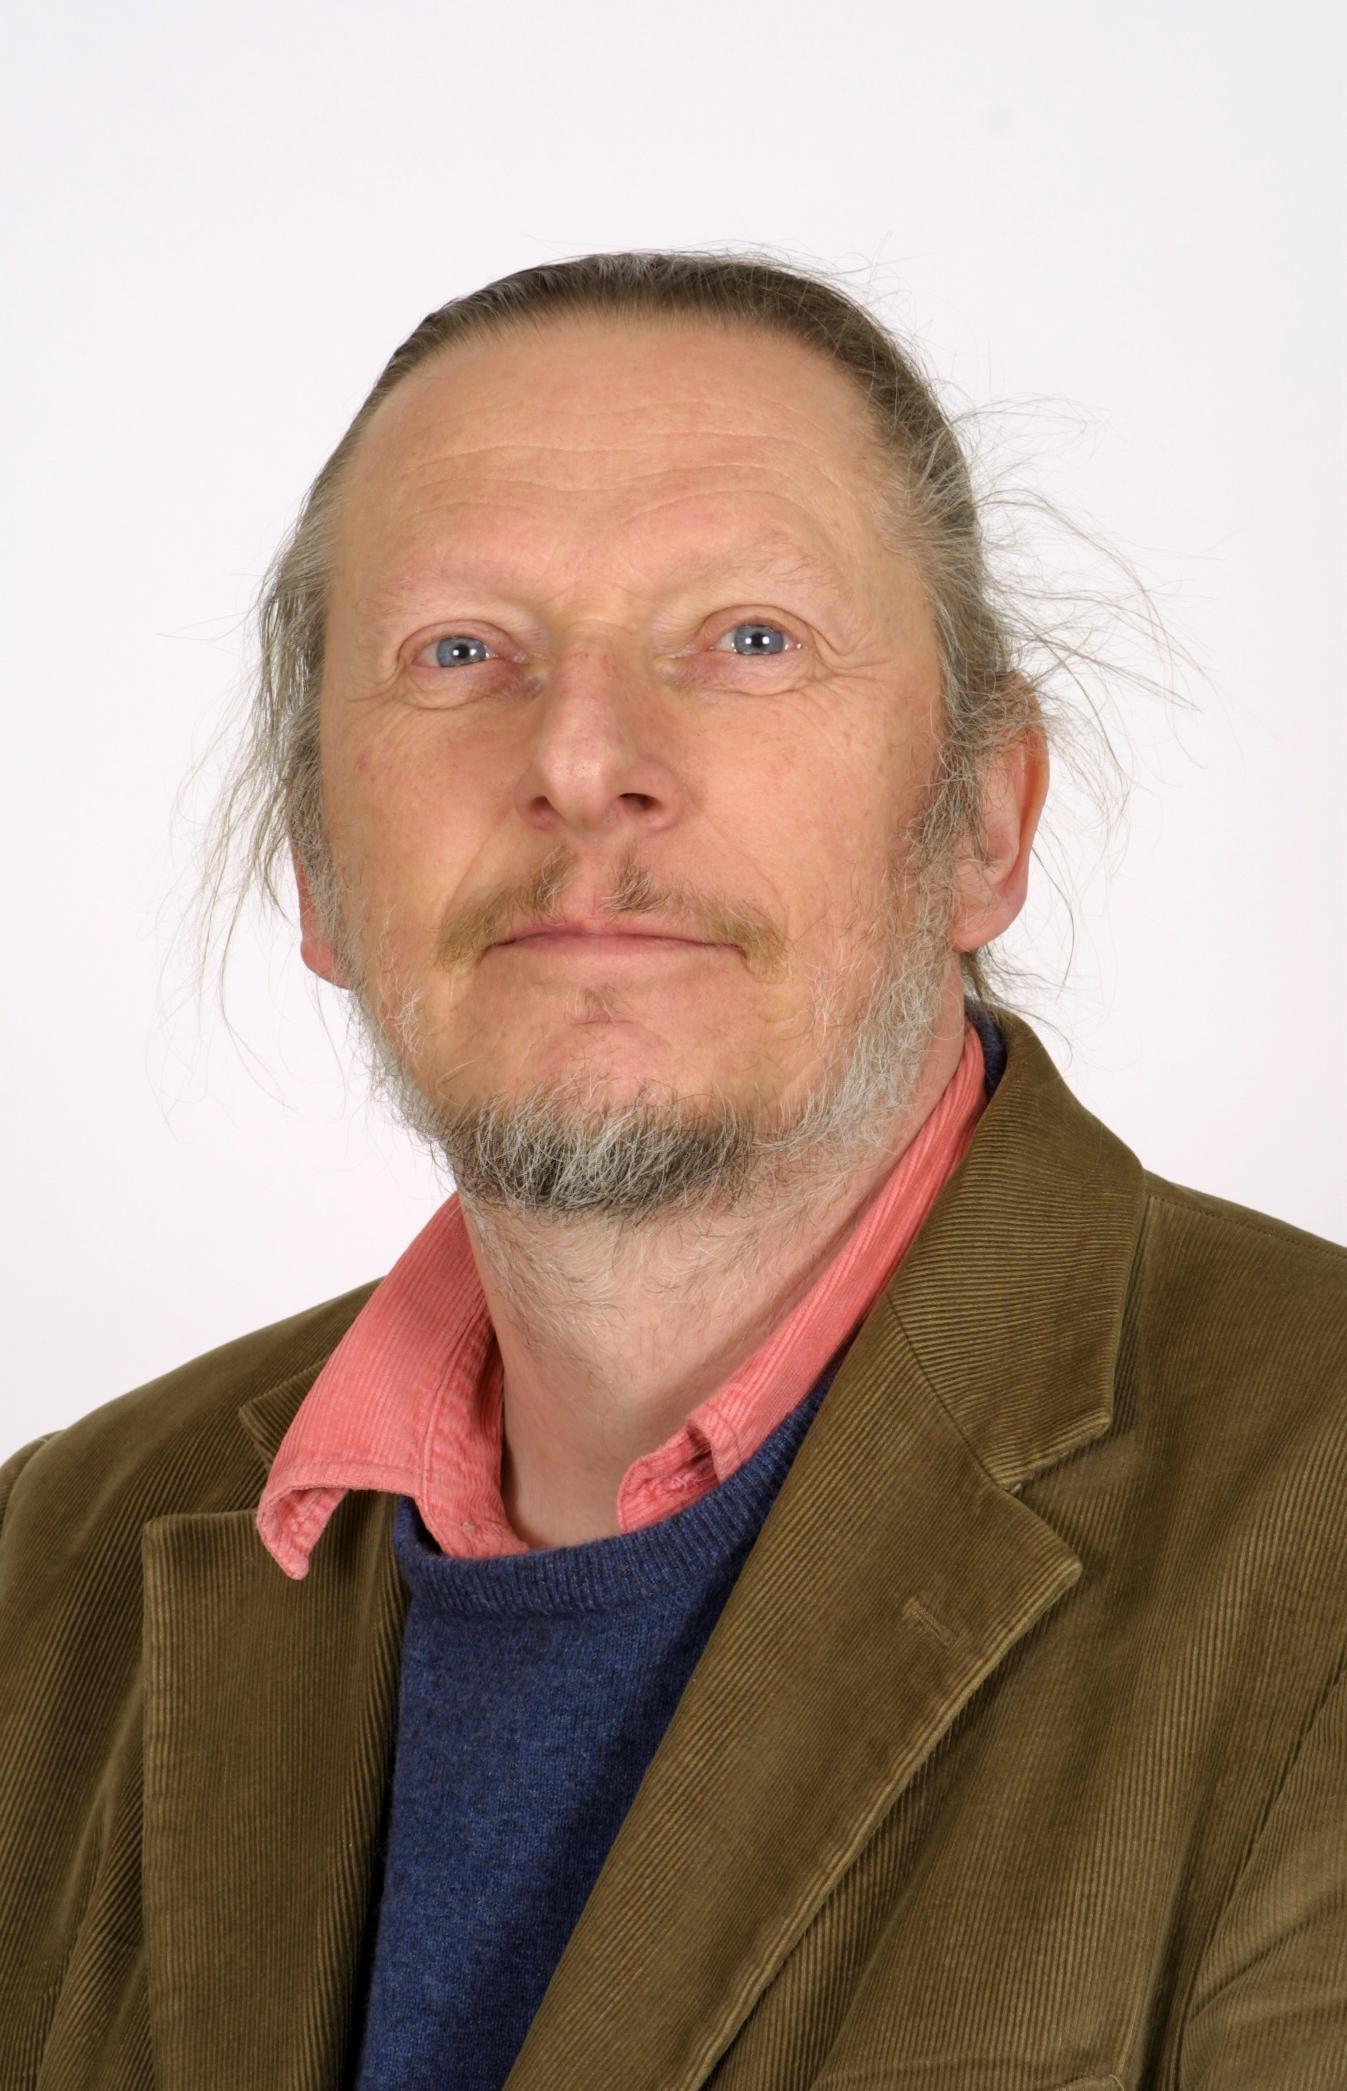 David Tolhurst